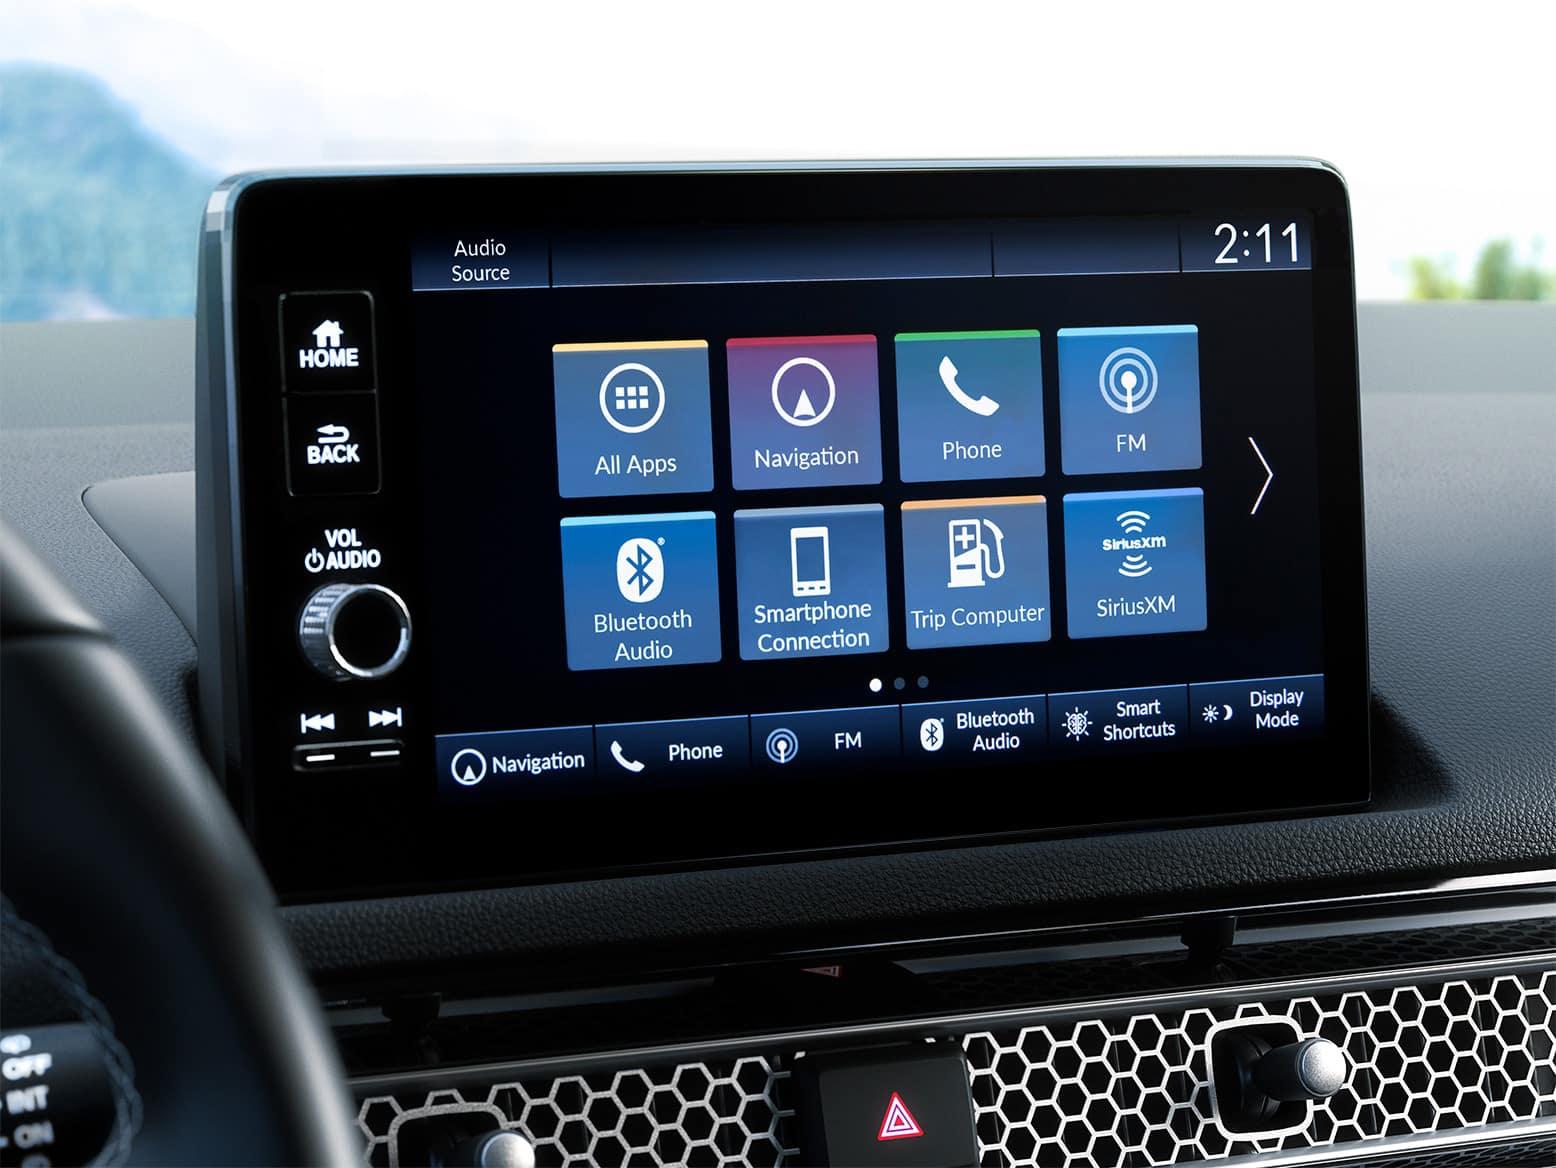 2022 Honda Civic hatchback with Honda Satellite Linked Navigation System